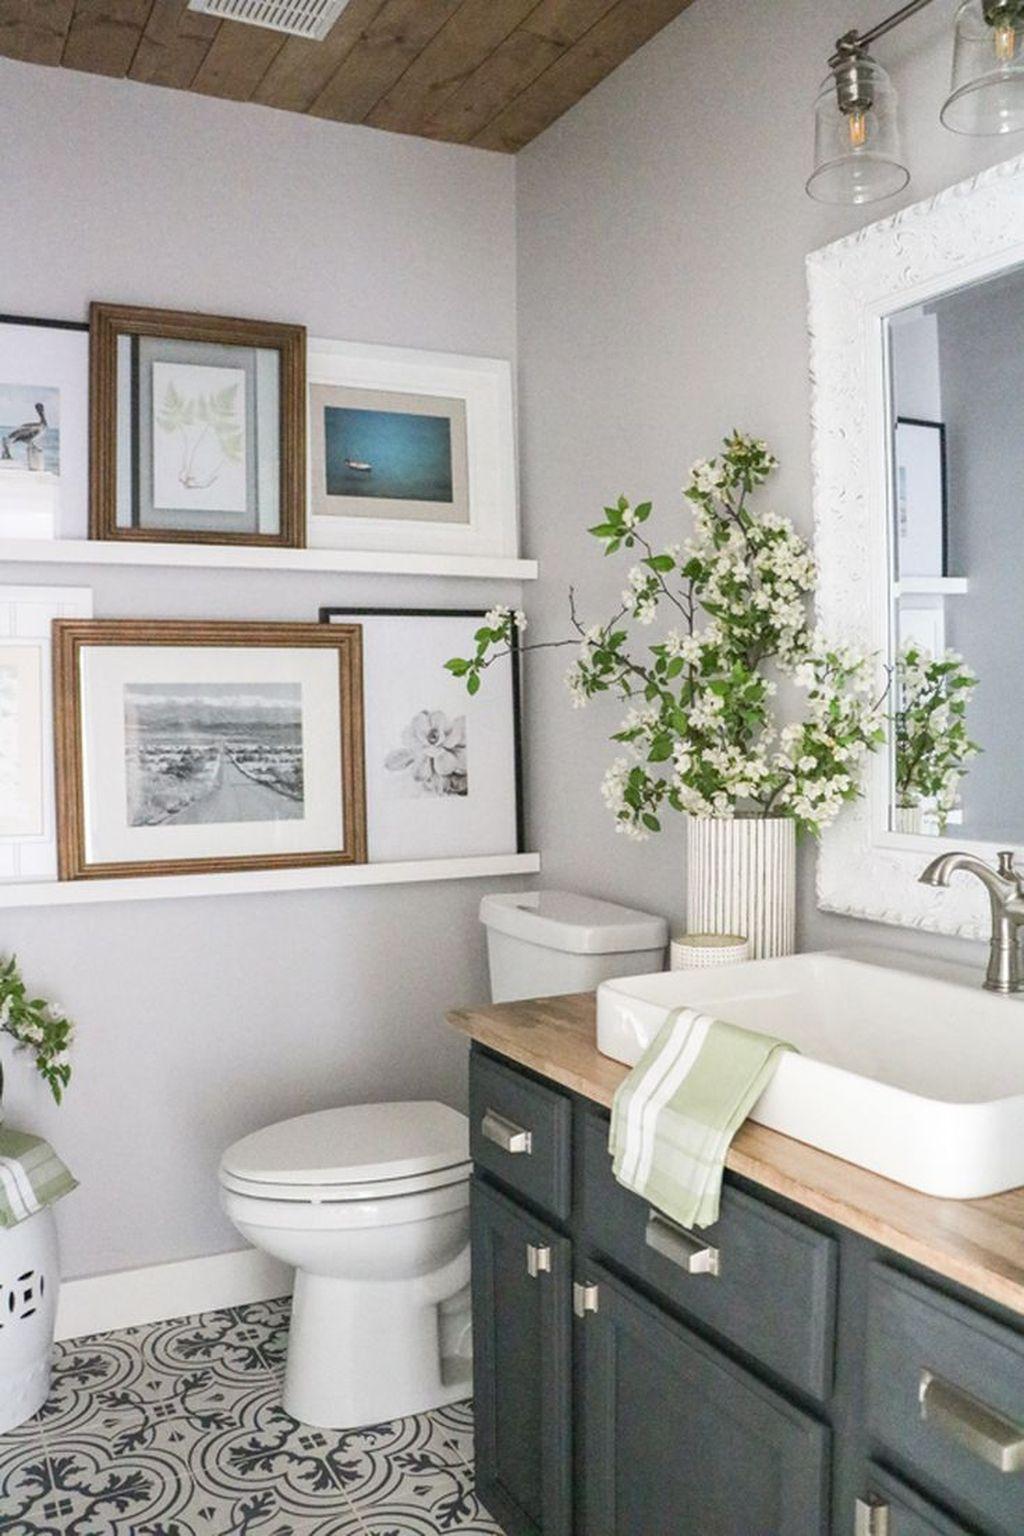 73 Modern Farmhouse Bathroom Remodel Ideas | Pinterest | Modern ...